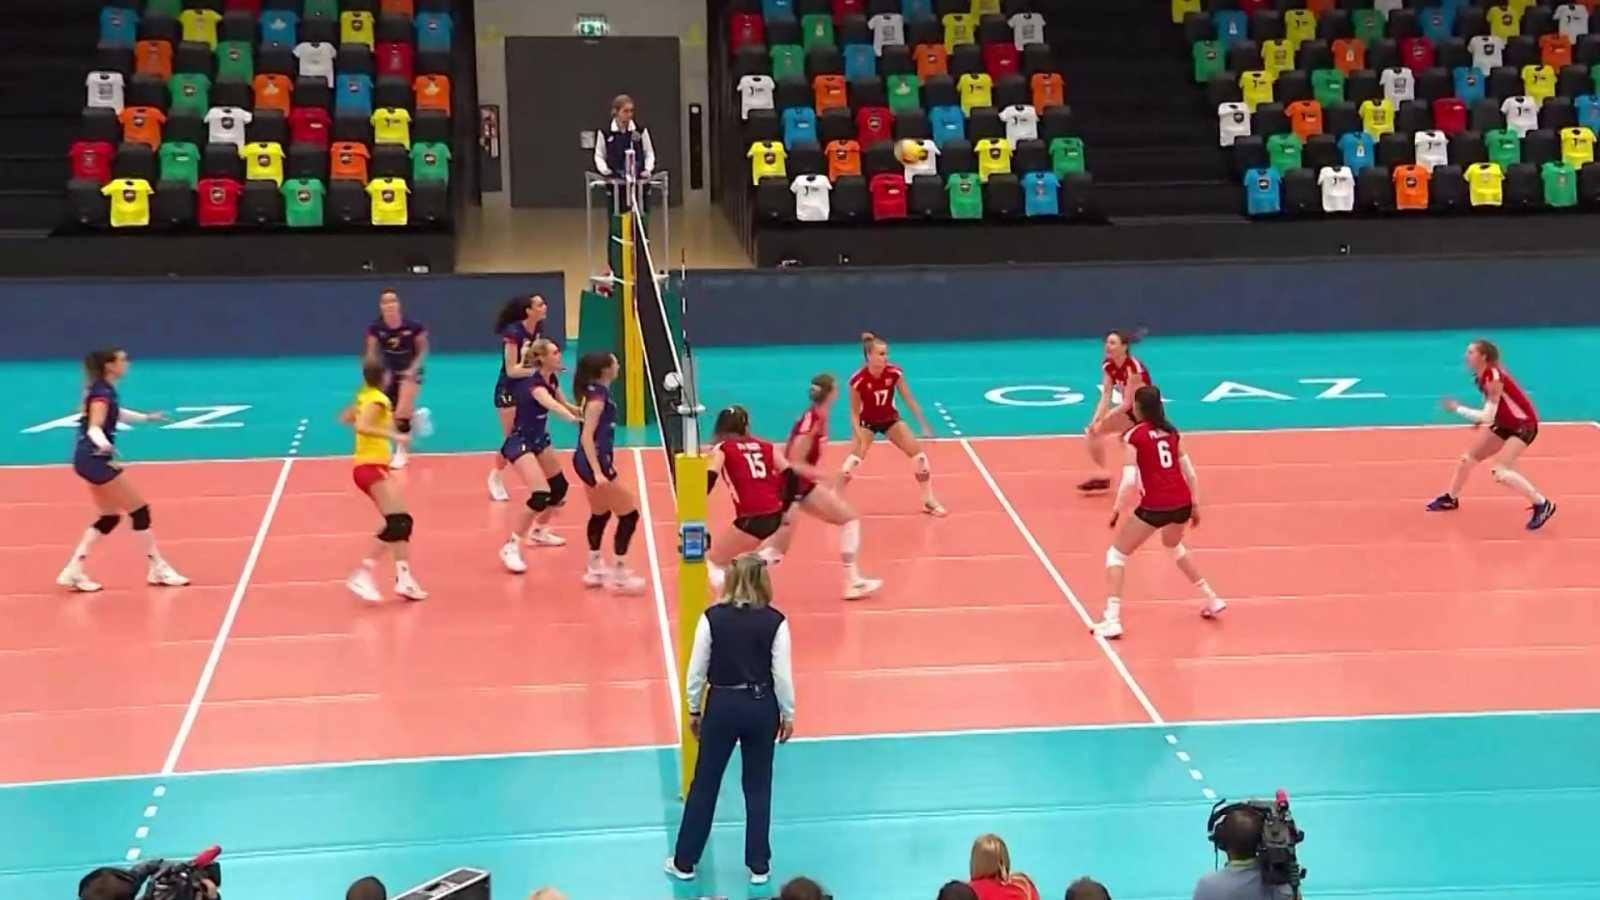 Voleibol - Clasificación Campeonato de Europa femenino 4ª jornada: Austria - España - ver ahora